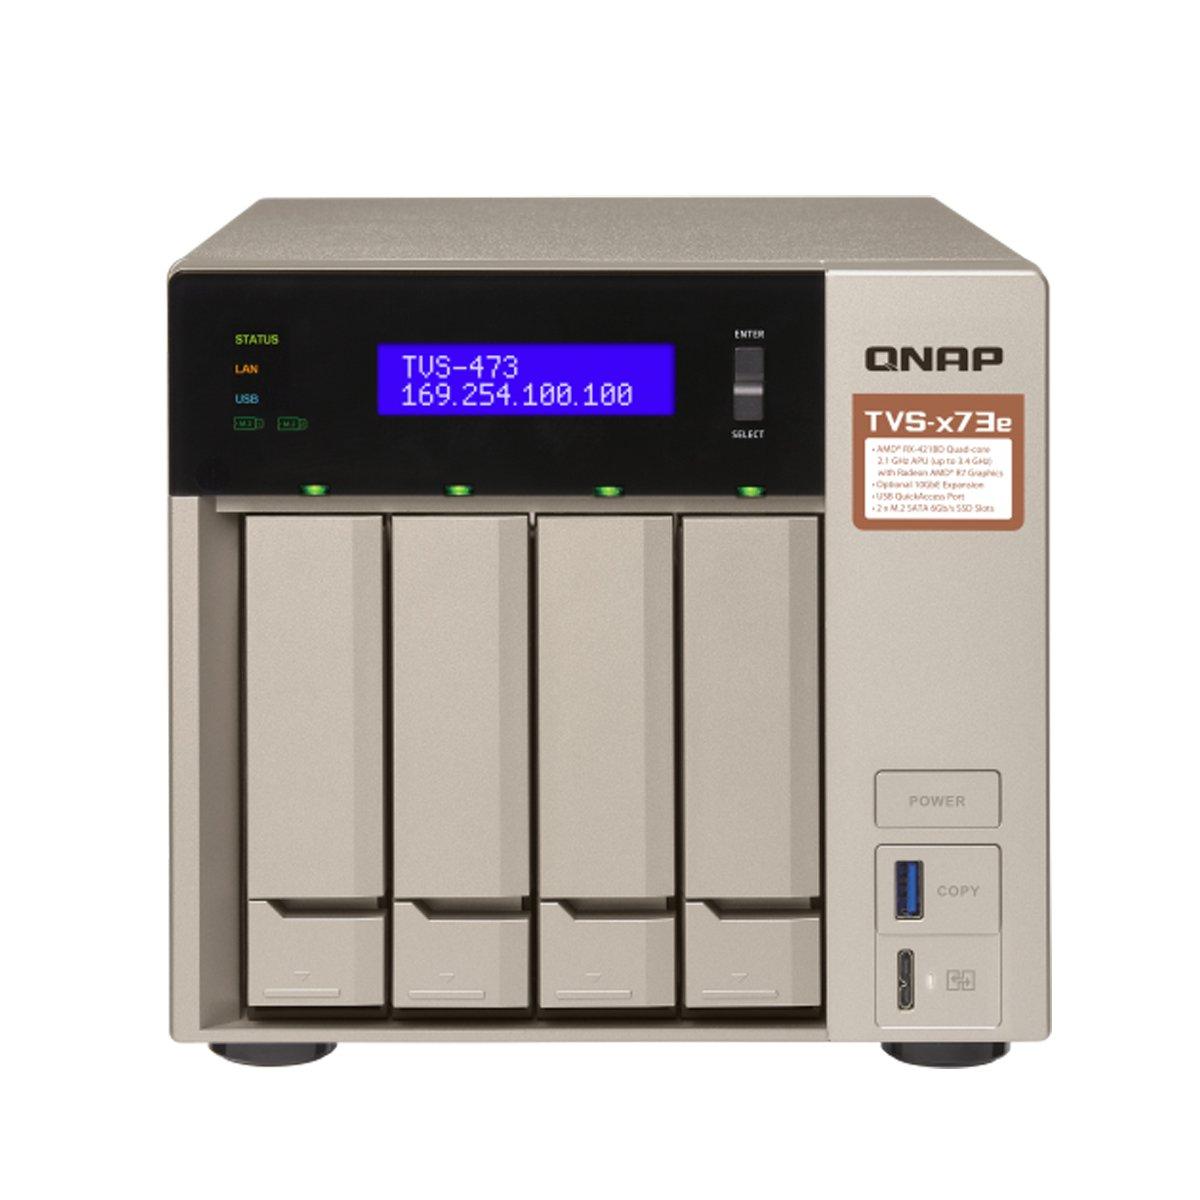 Qnap 4-bay NAS/iSCSI IP-SAN, AMD R series Quad-core 2.1GHz, 8GB RAM, 10G-ready (TVS-473e-8G-US)